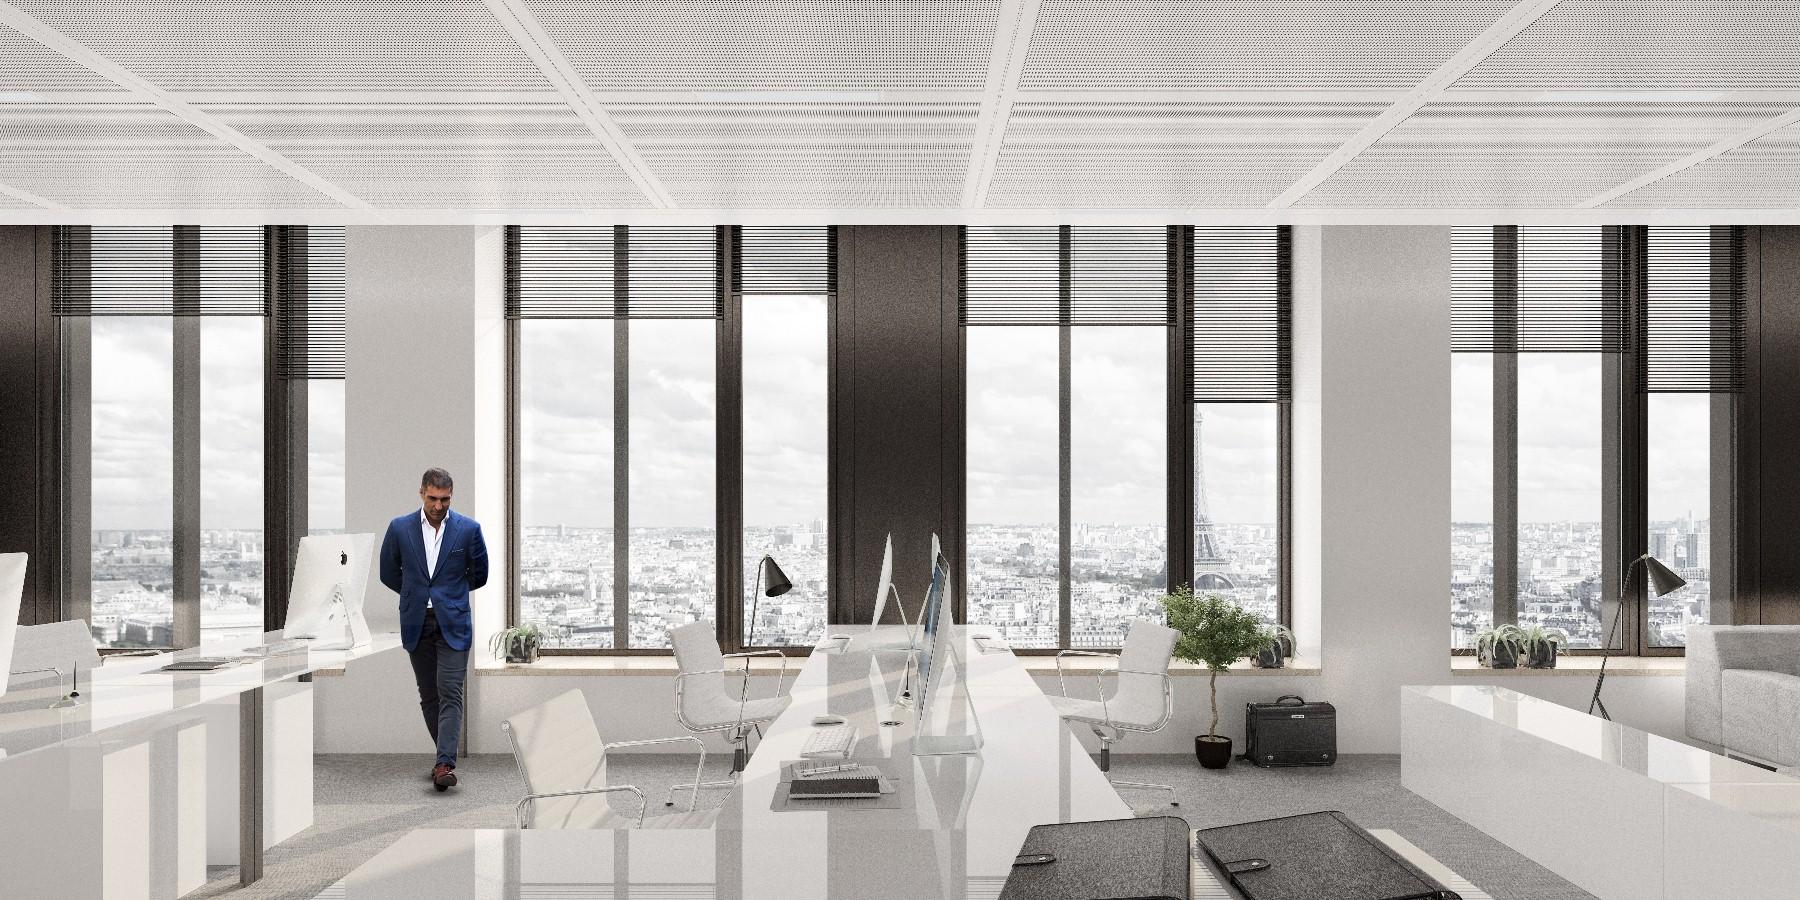 Visualizing architecture - commercial rendering 5 - MONOMO